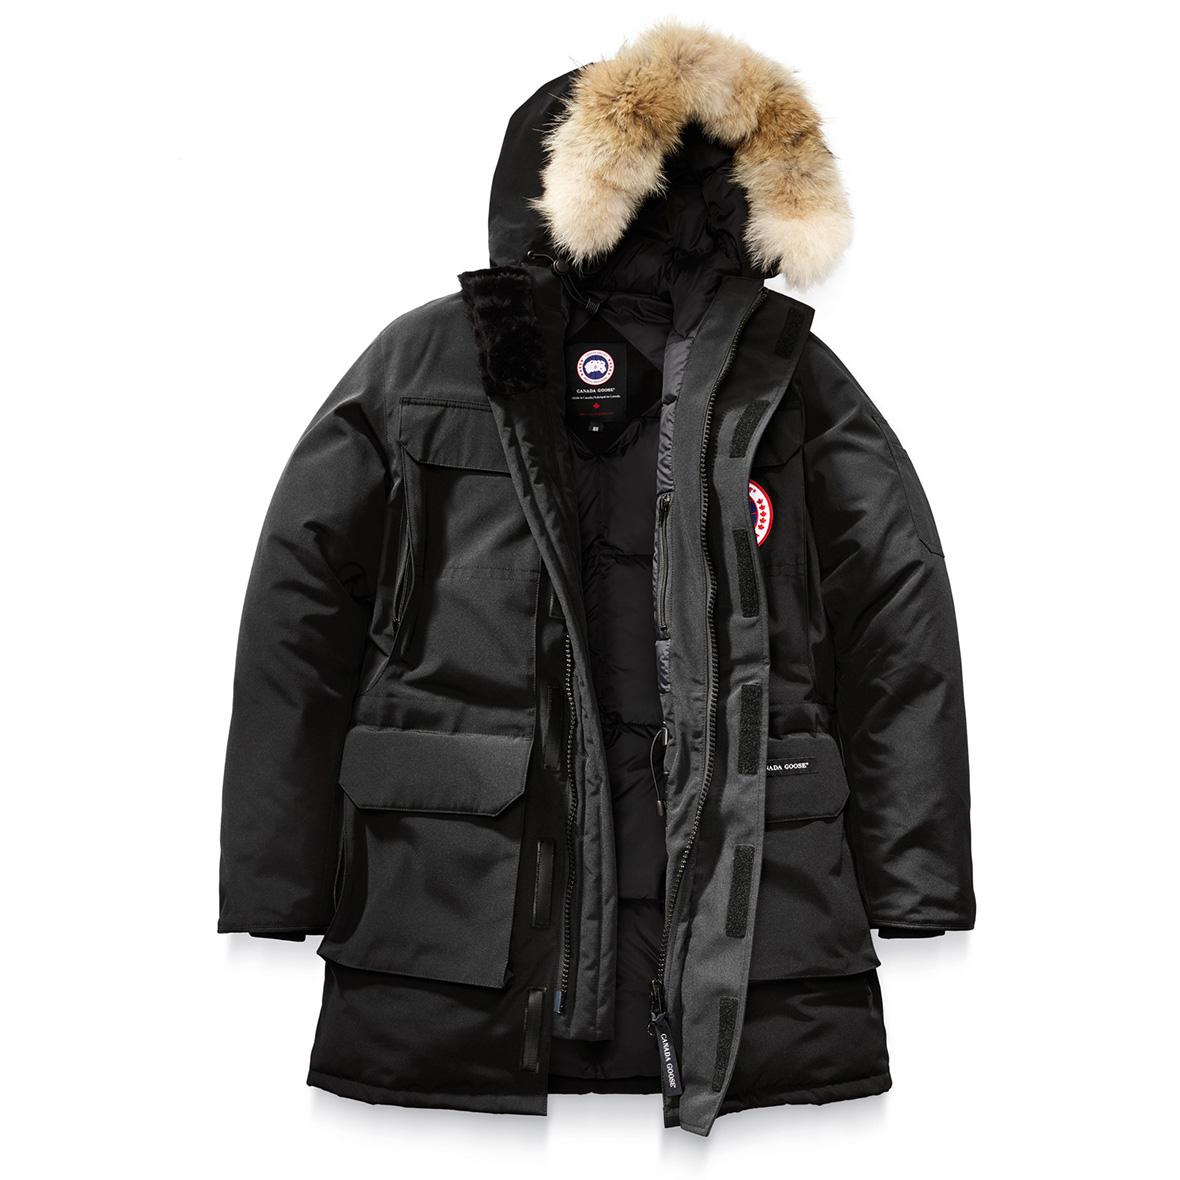 Canada Goose Coats for Men | Canada Goose Warmth Rating | Canada Goose Citadel